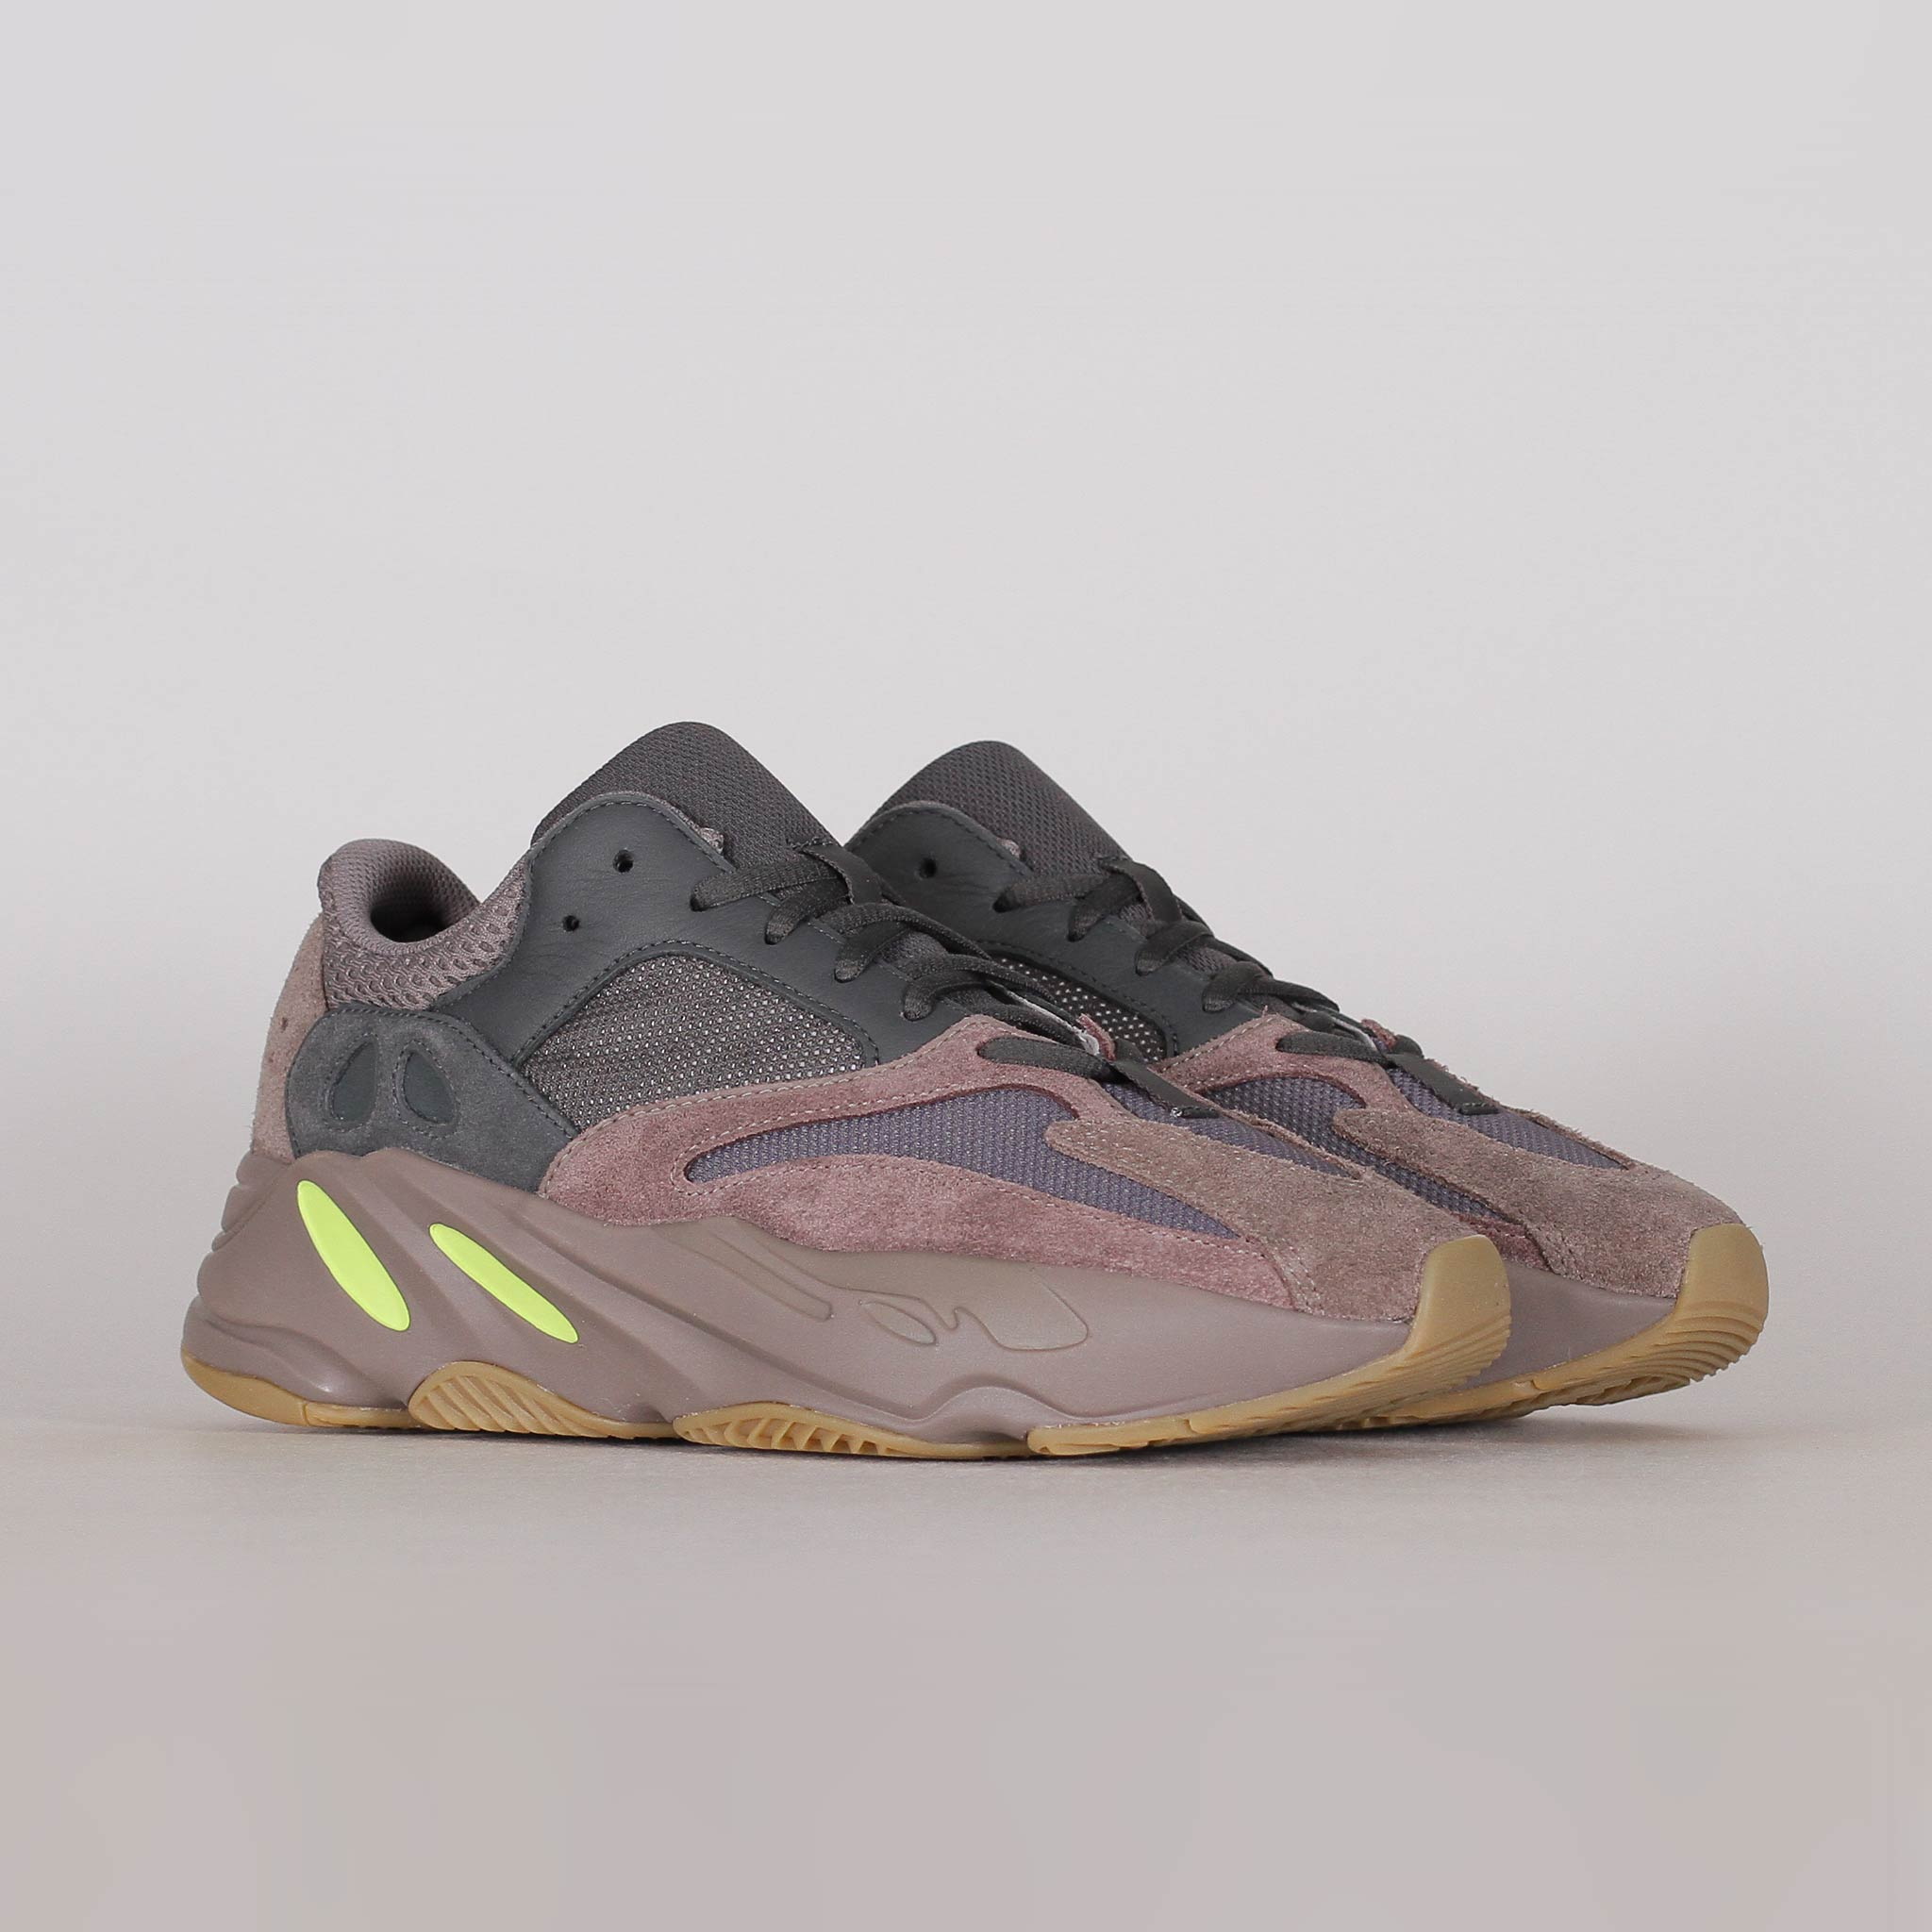 Adidas Yeezy Boost 700 Mauve (EE9614)